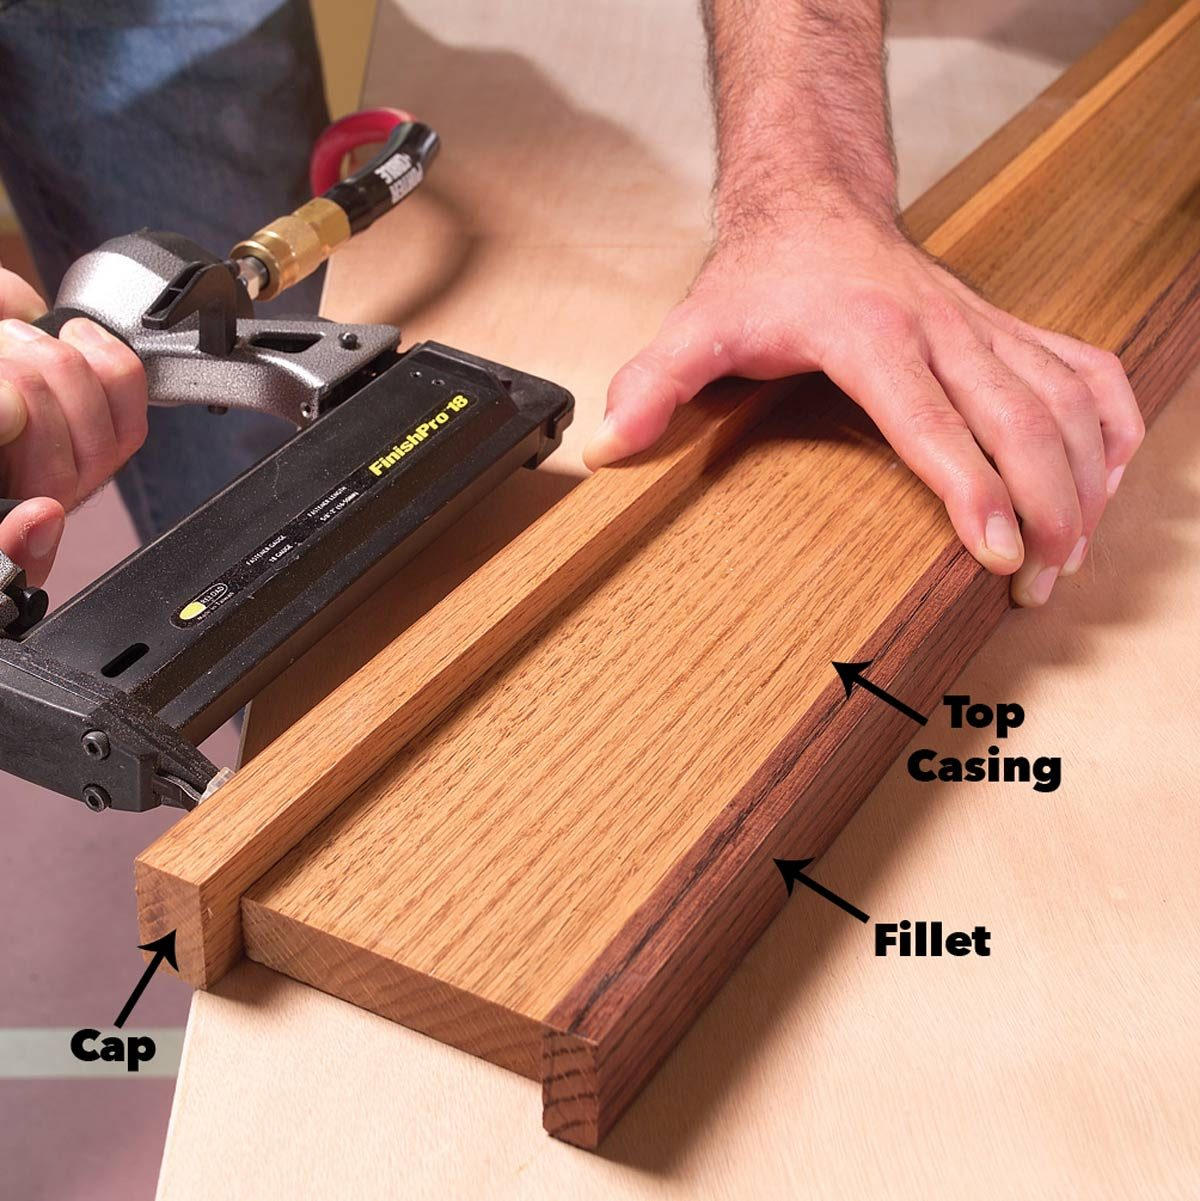 Attach trim cap and fillet pieces